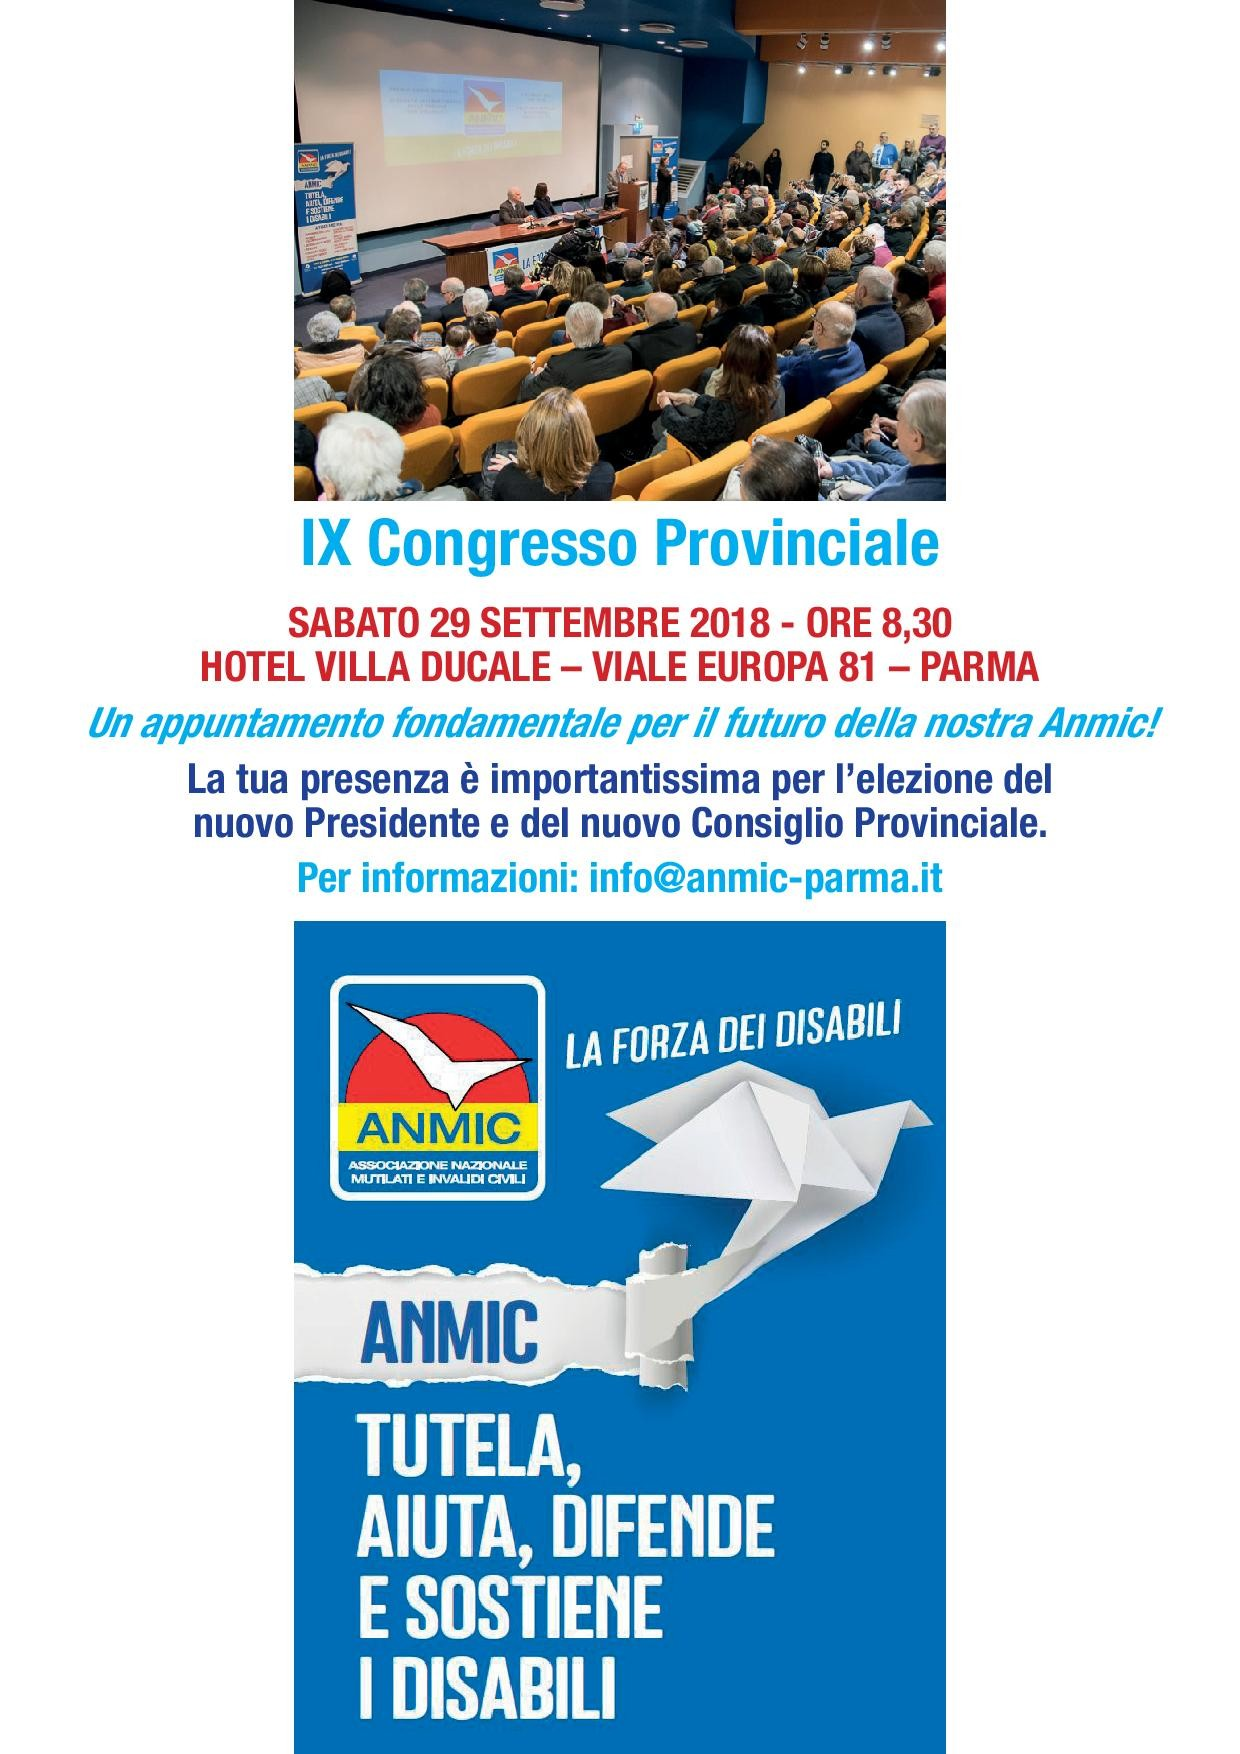 IX Congresso Provinciale Anmic